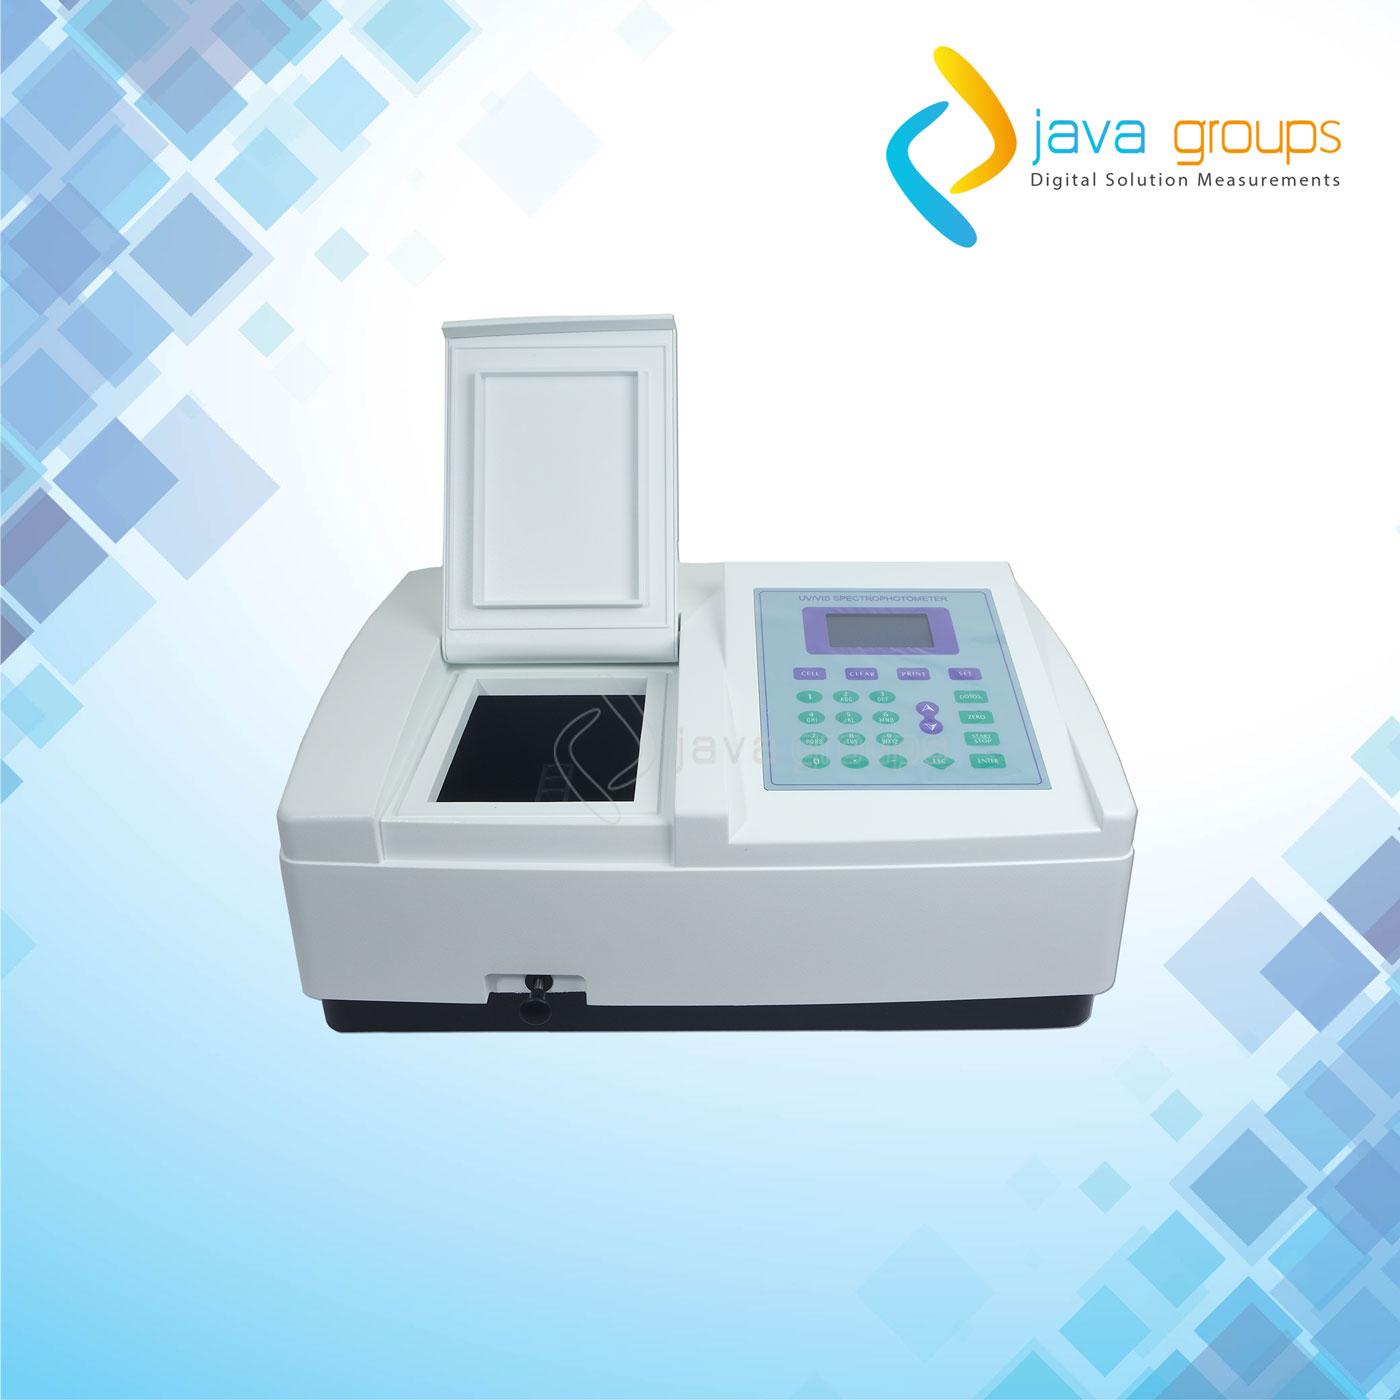 Alat Spektrofotometer Pengukur Absorbansi Seri AMV11PC